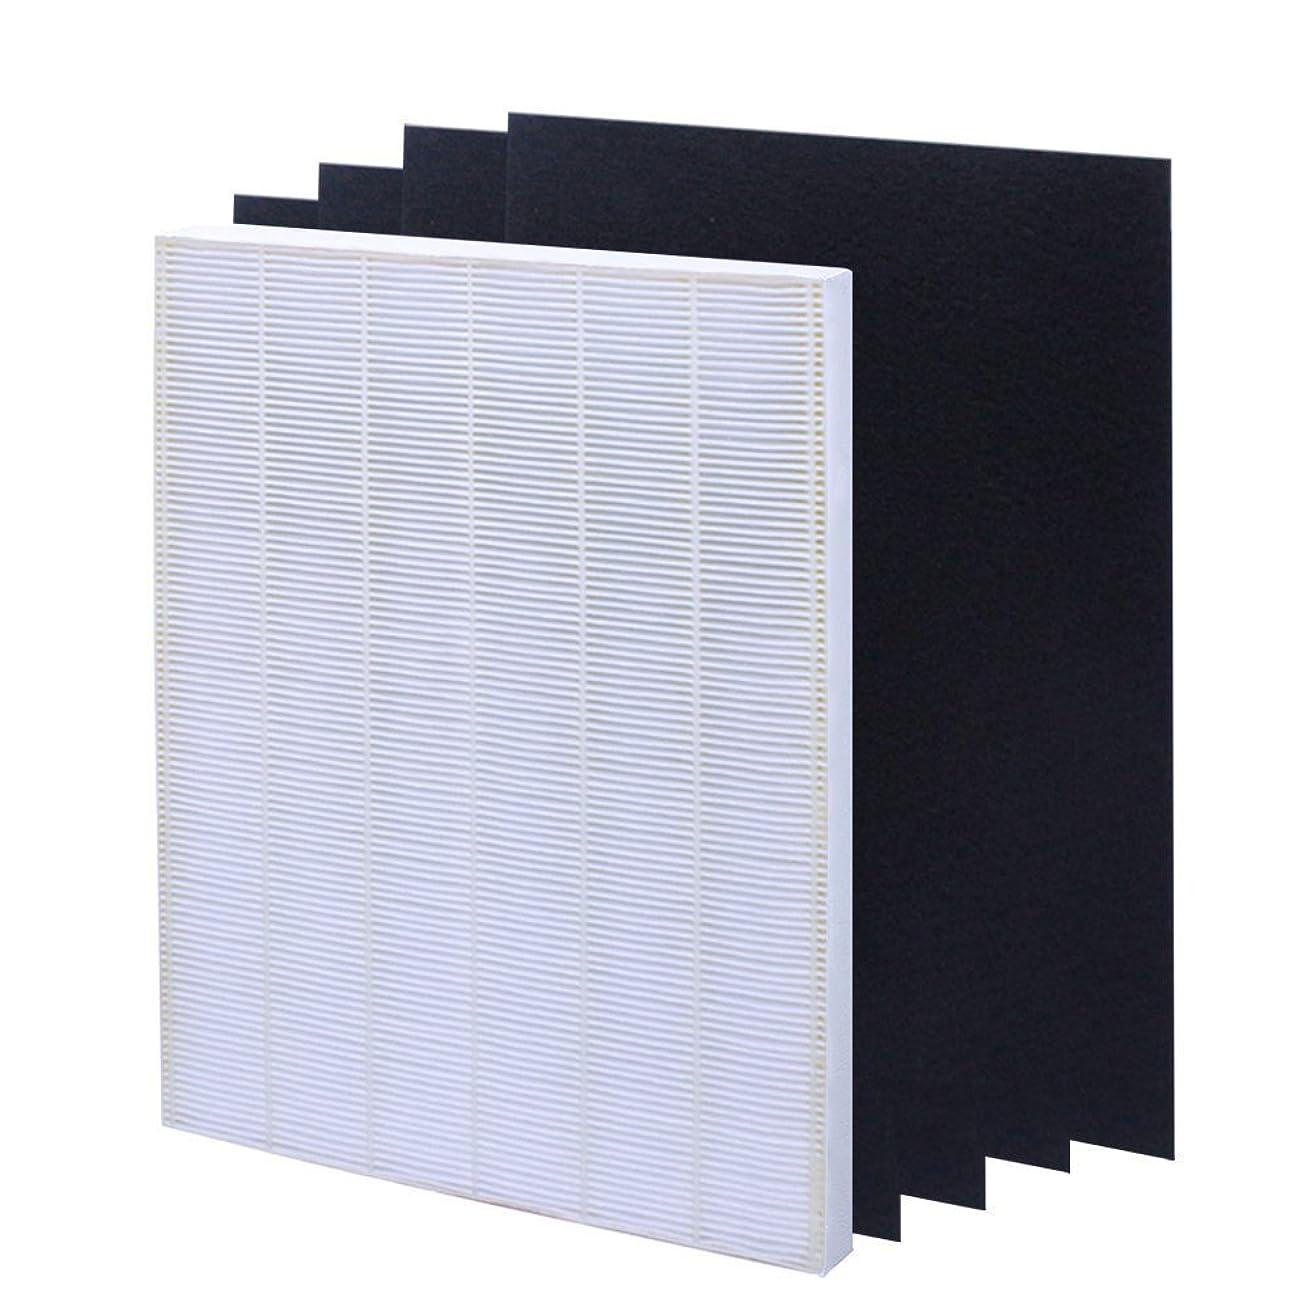 isinlive True HEPA Plus 4 Carbon Replacement Filter A 115115 Size 21 for Winix PlasmaWave air Purifier 5300 6300 5300-2 6300-2 P300 C535